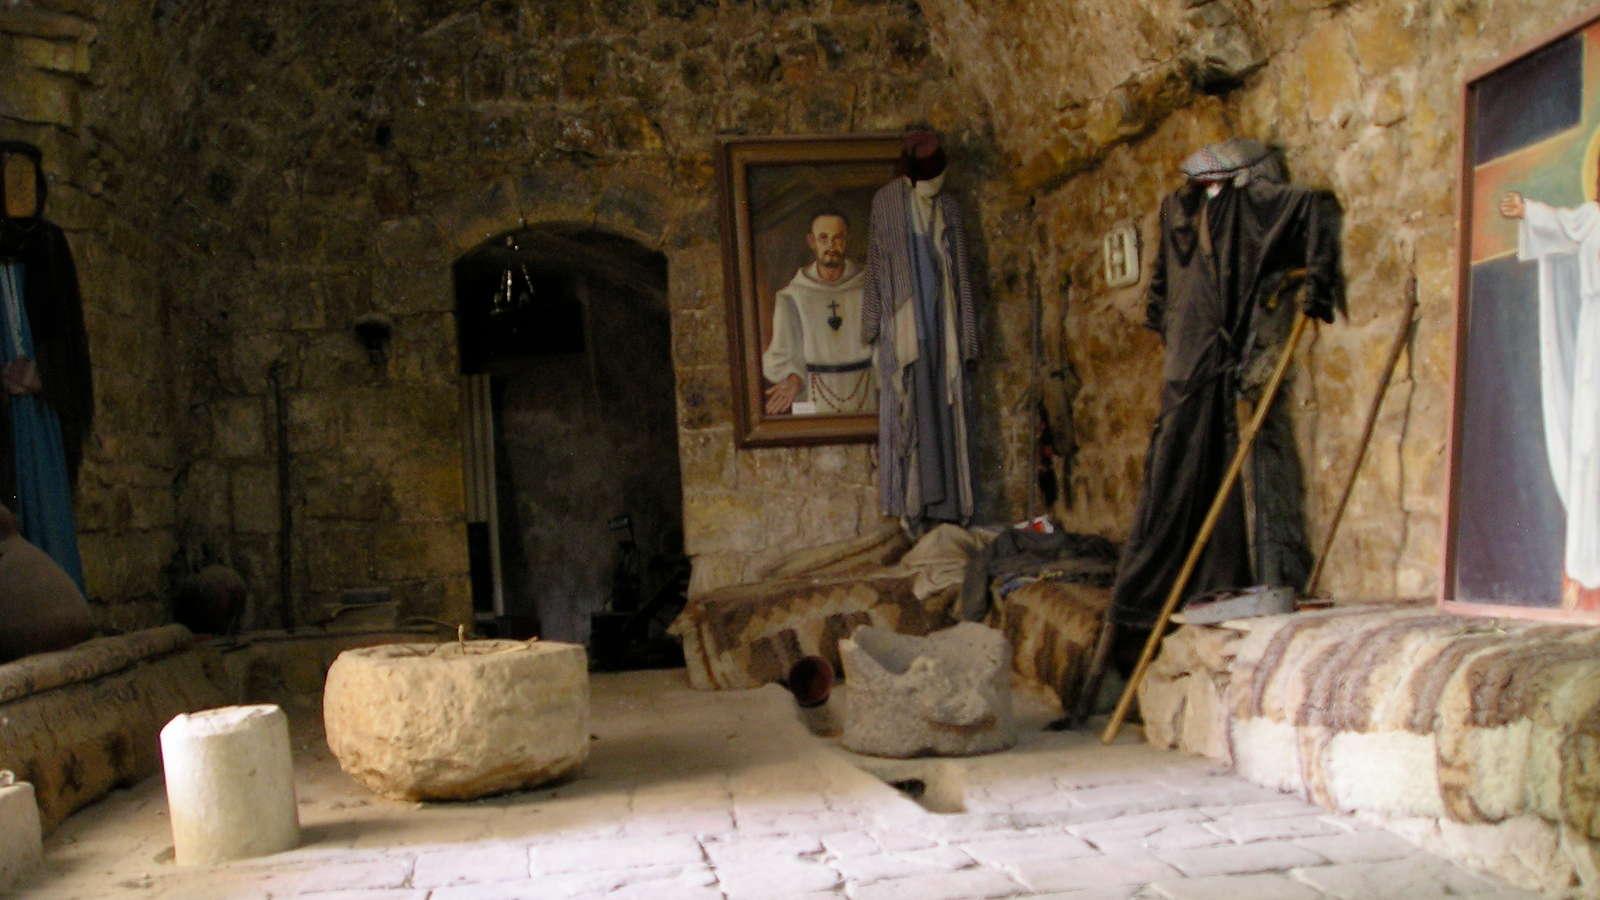 Foto: Chamber of Bl. Charles de Foucauld